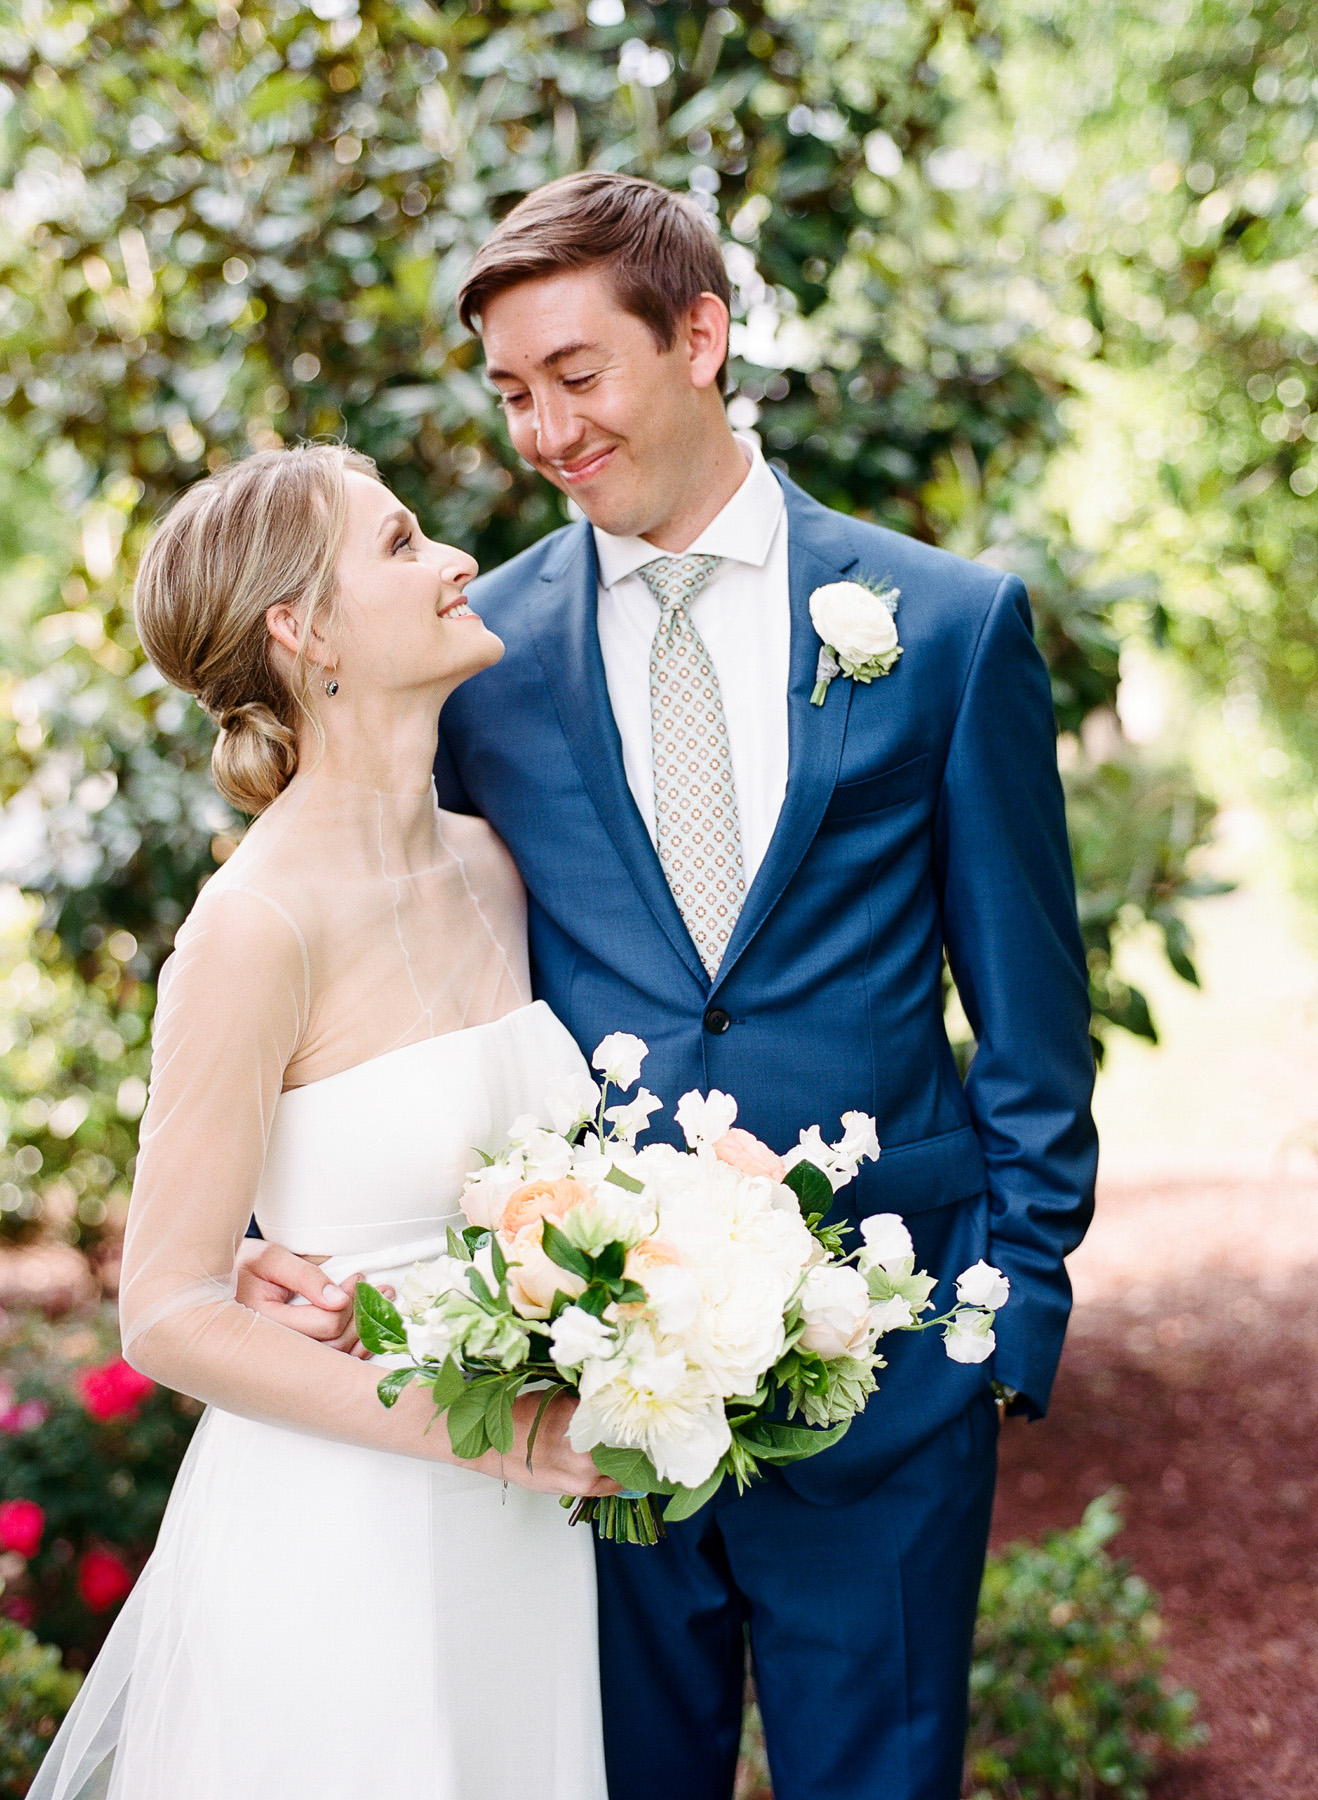 NC-wedding-photographer-best-12.jpg